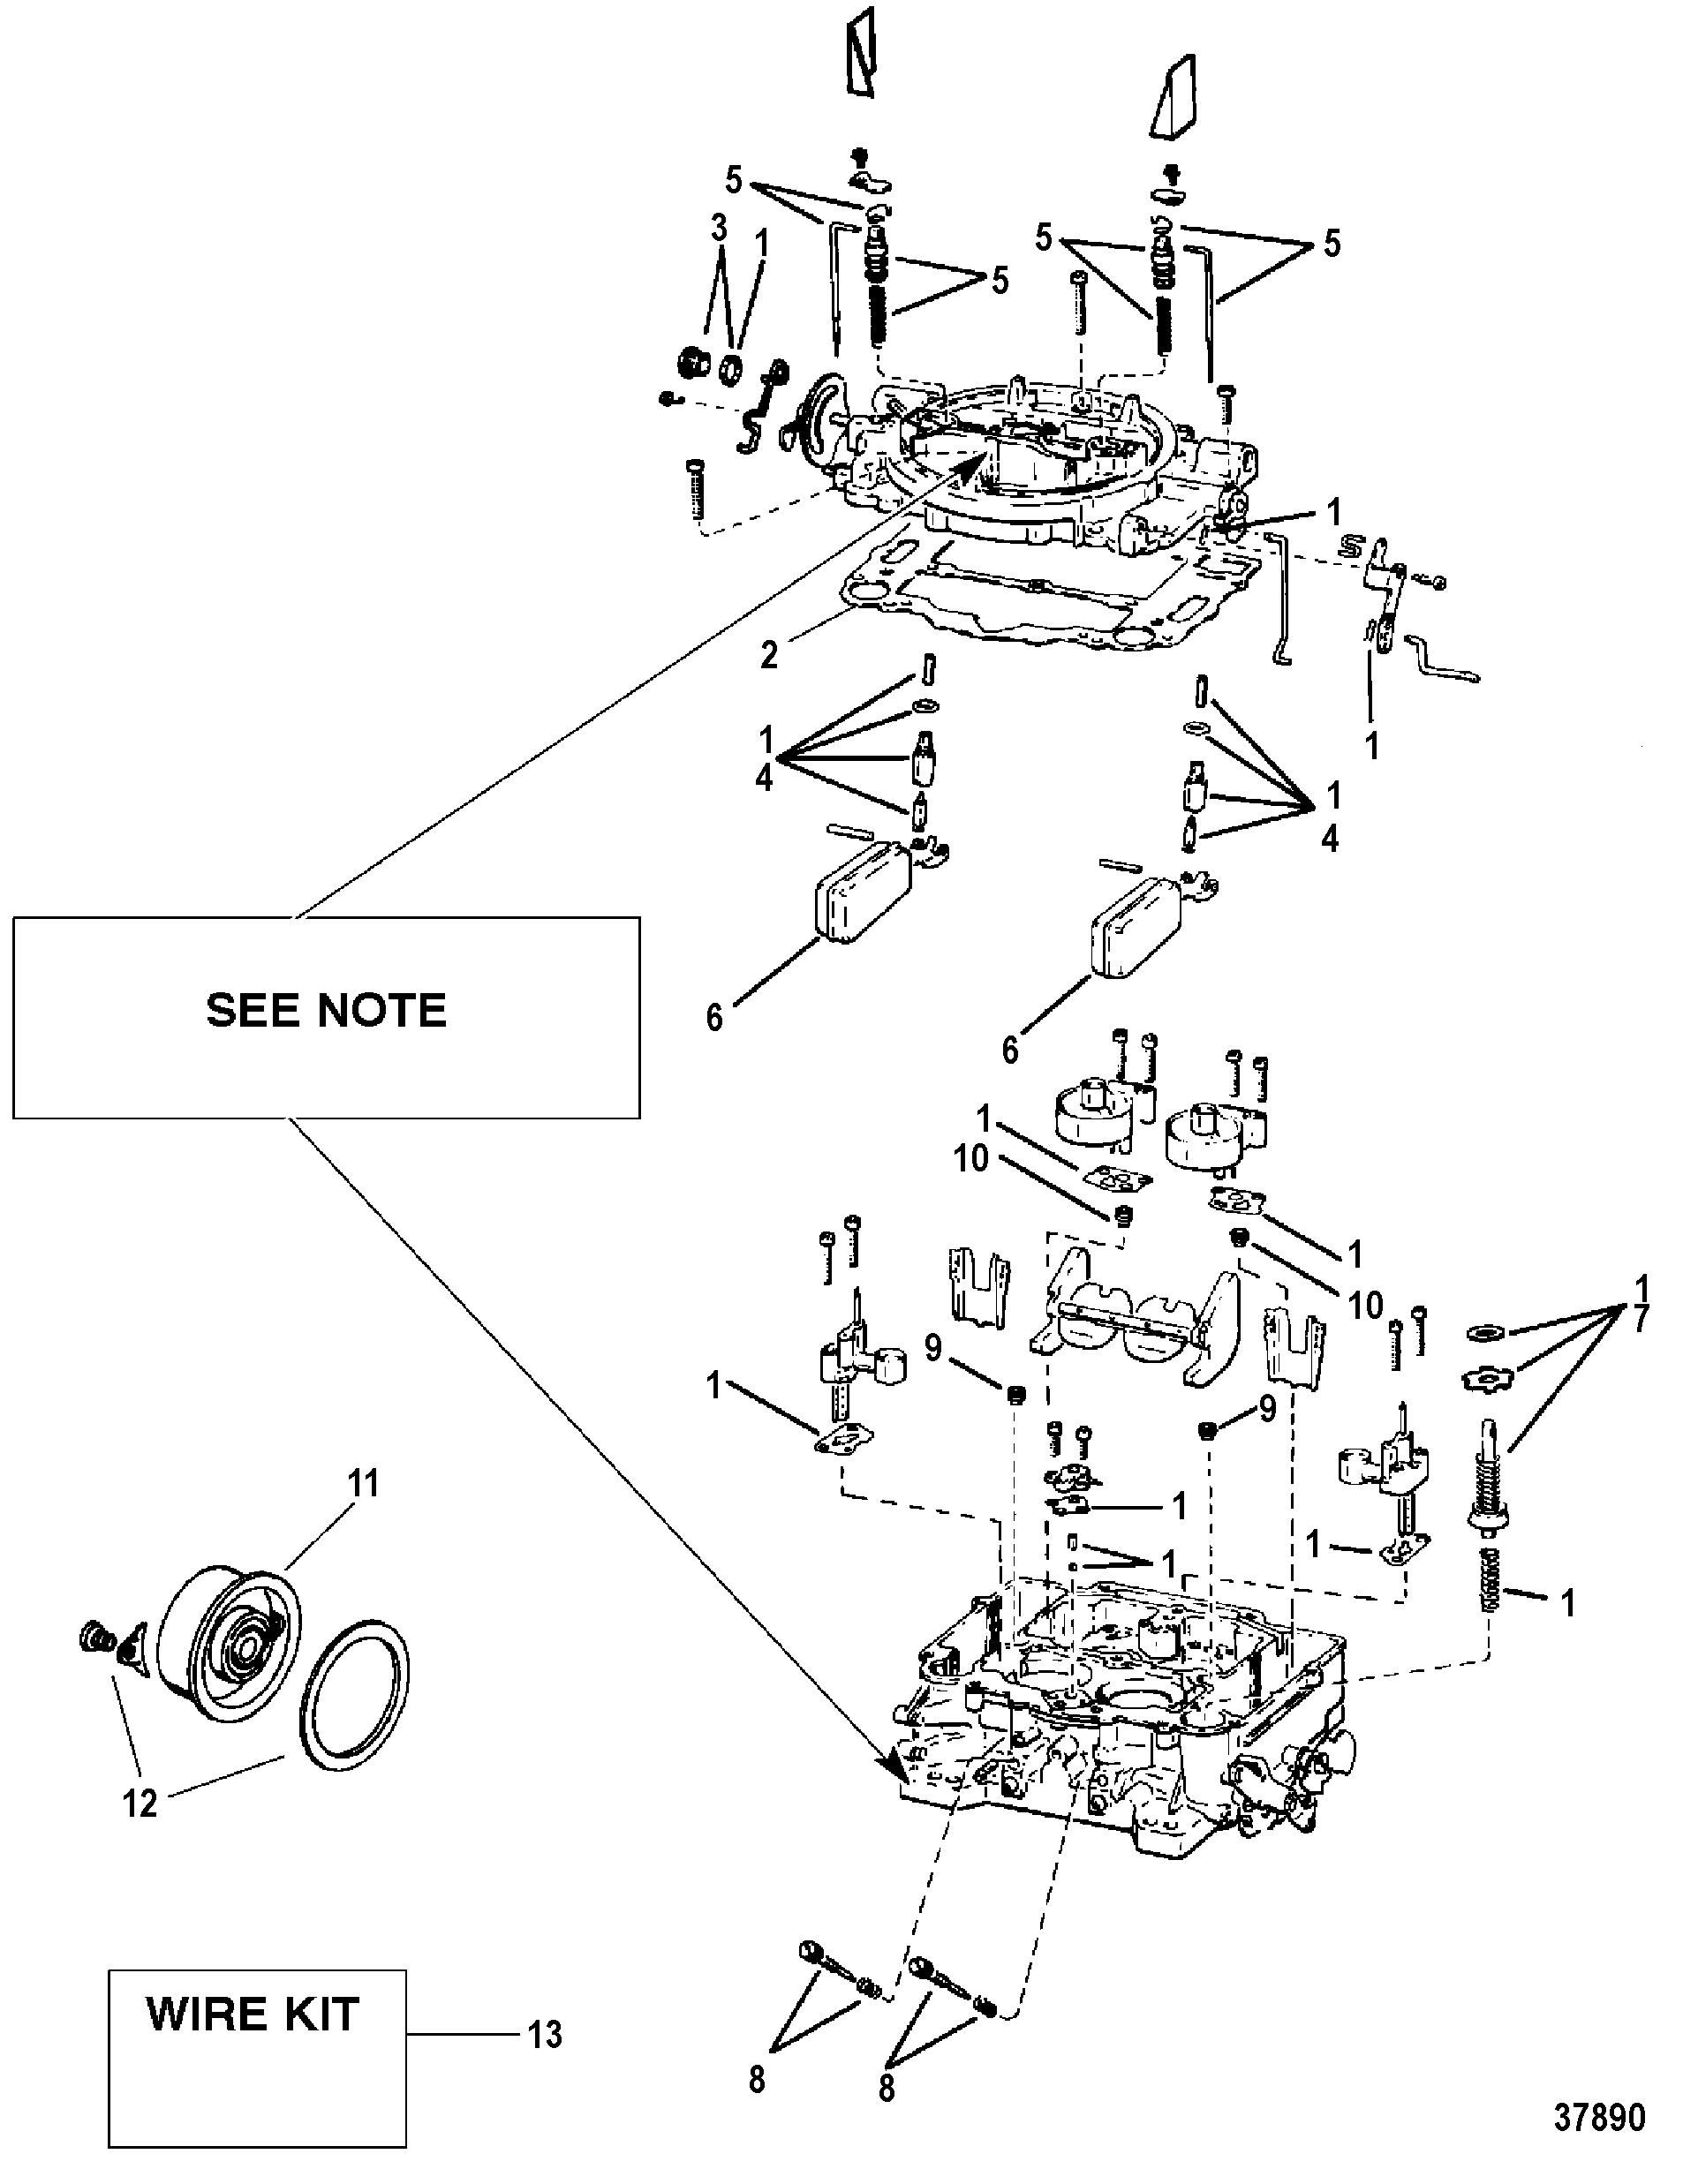 Weber Alpha Wiring Diagram Electrical Diagrams Cp Performance Carburetor Simple